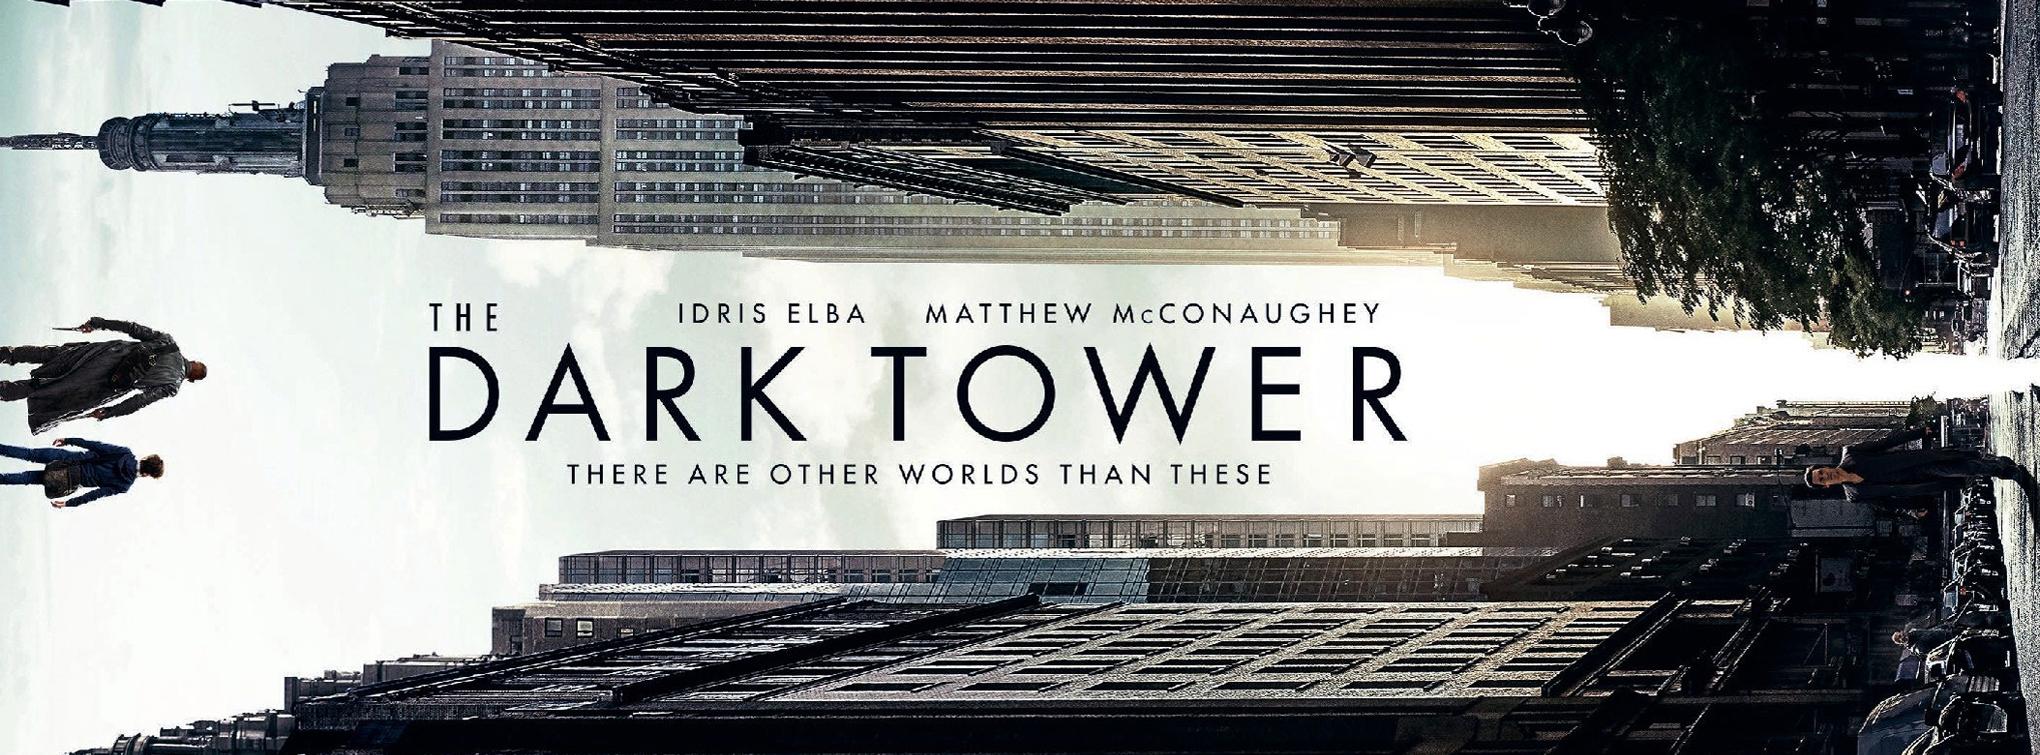 The Dark Tower premieres Thursday, August 3!